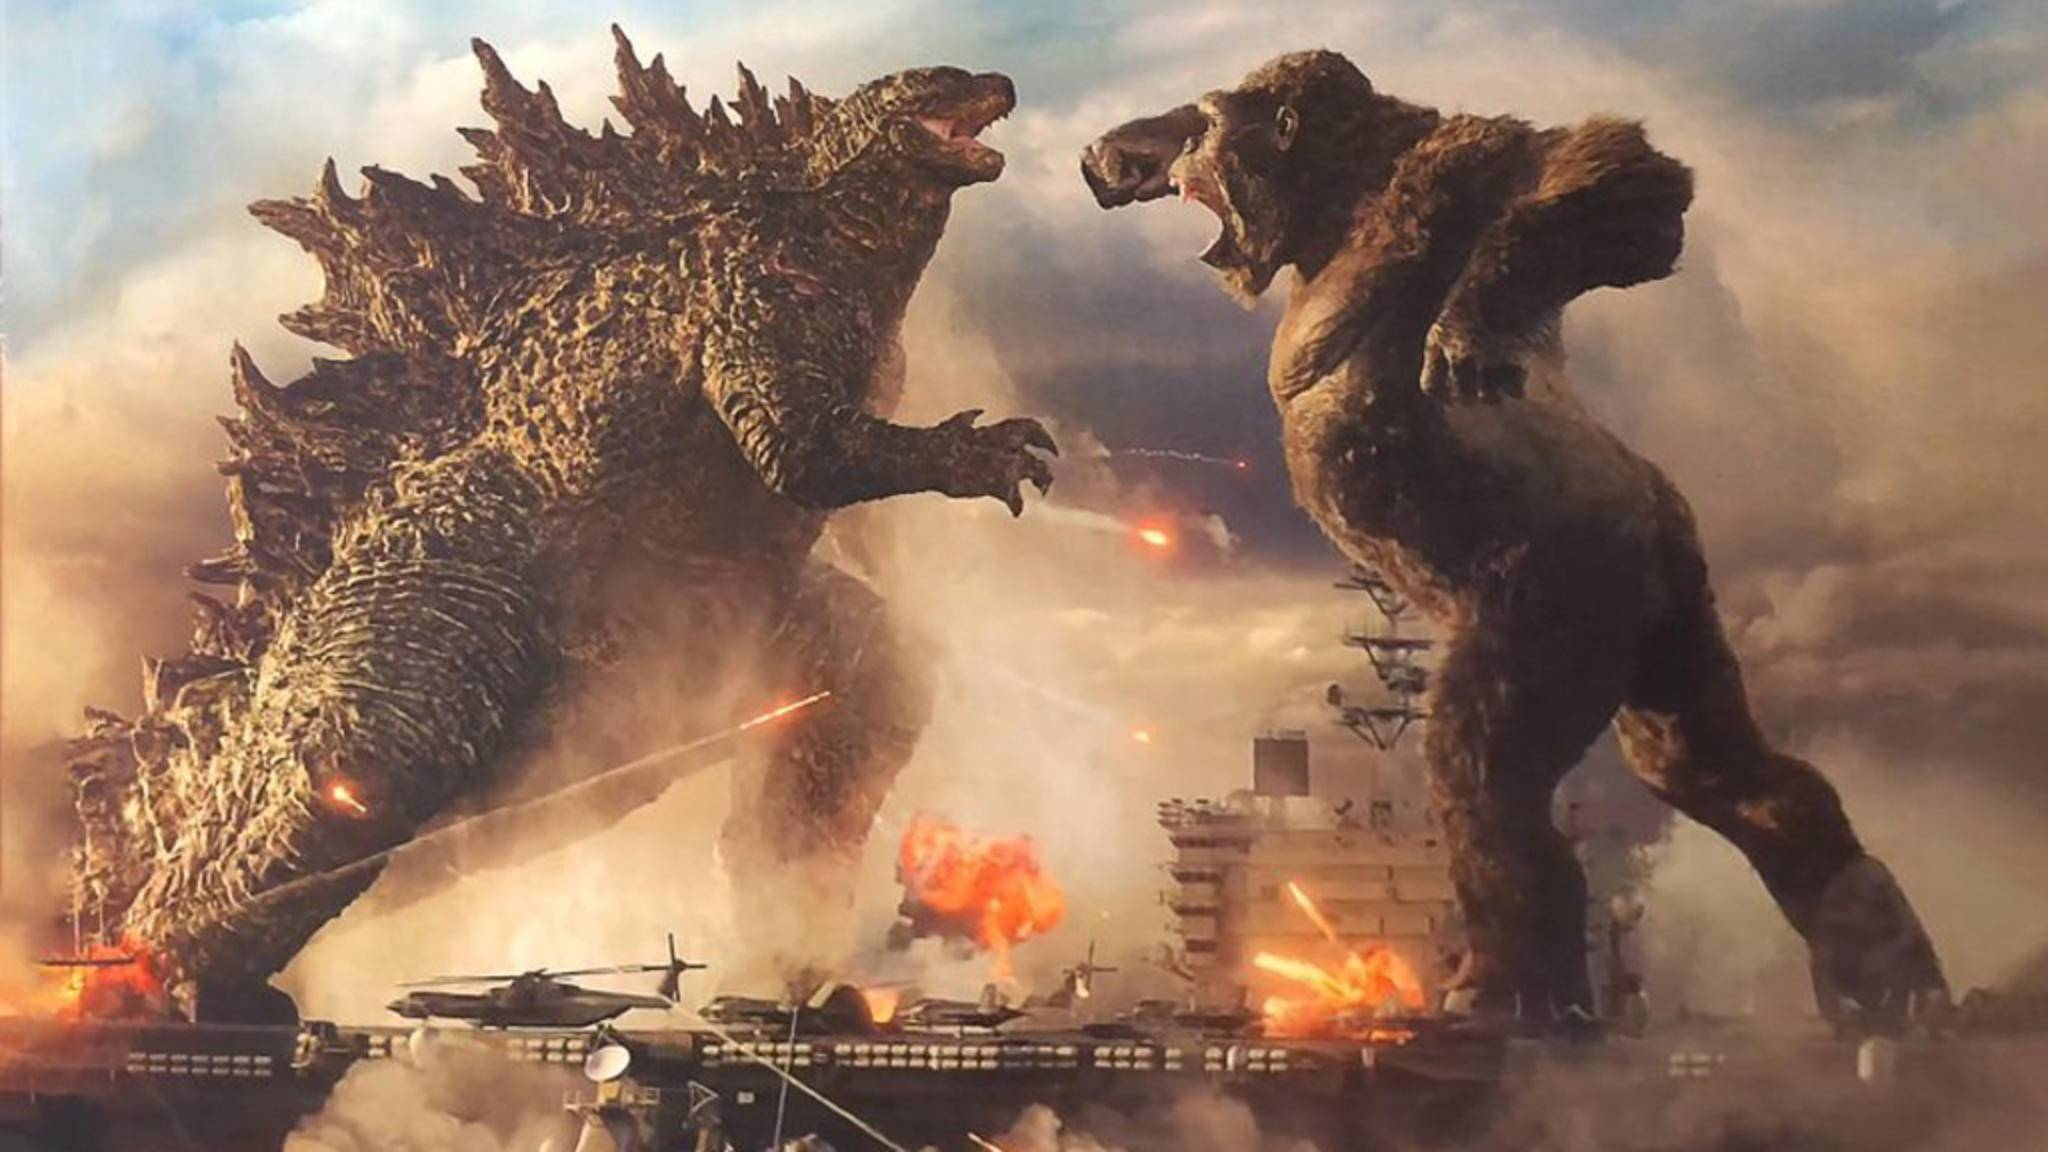 Godzilla vs. Kong Sneak Peek Art